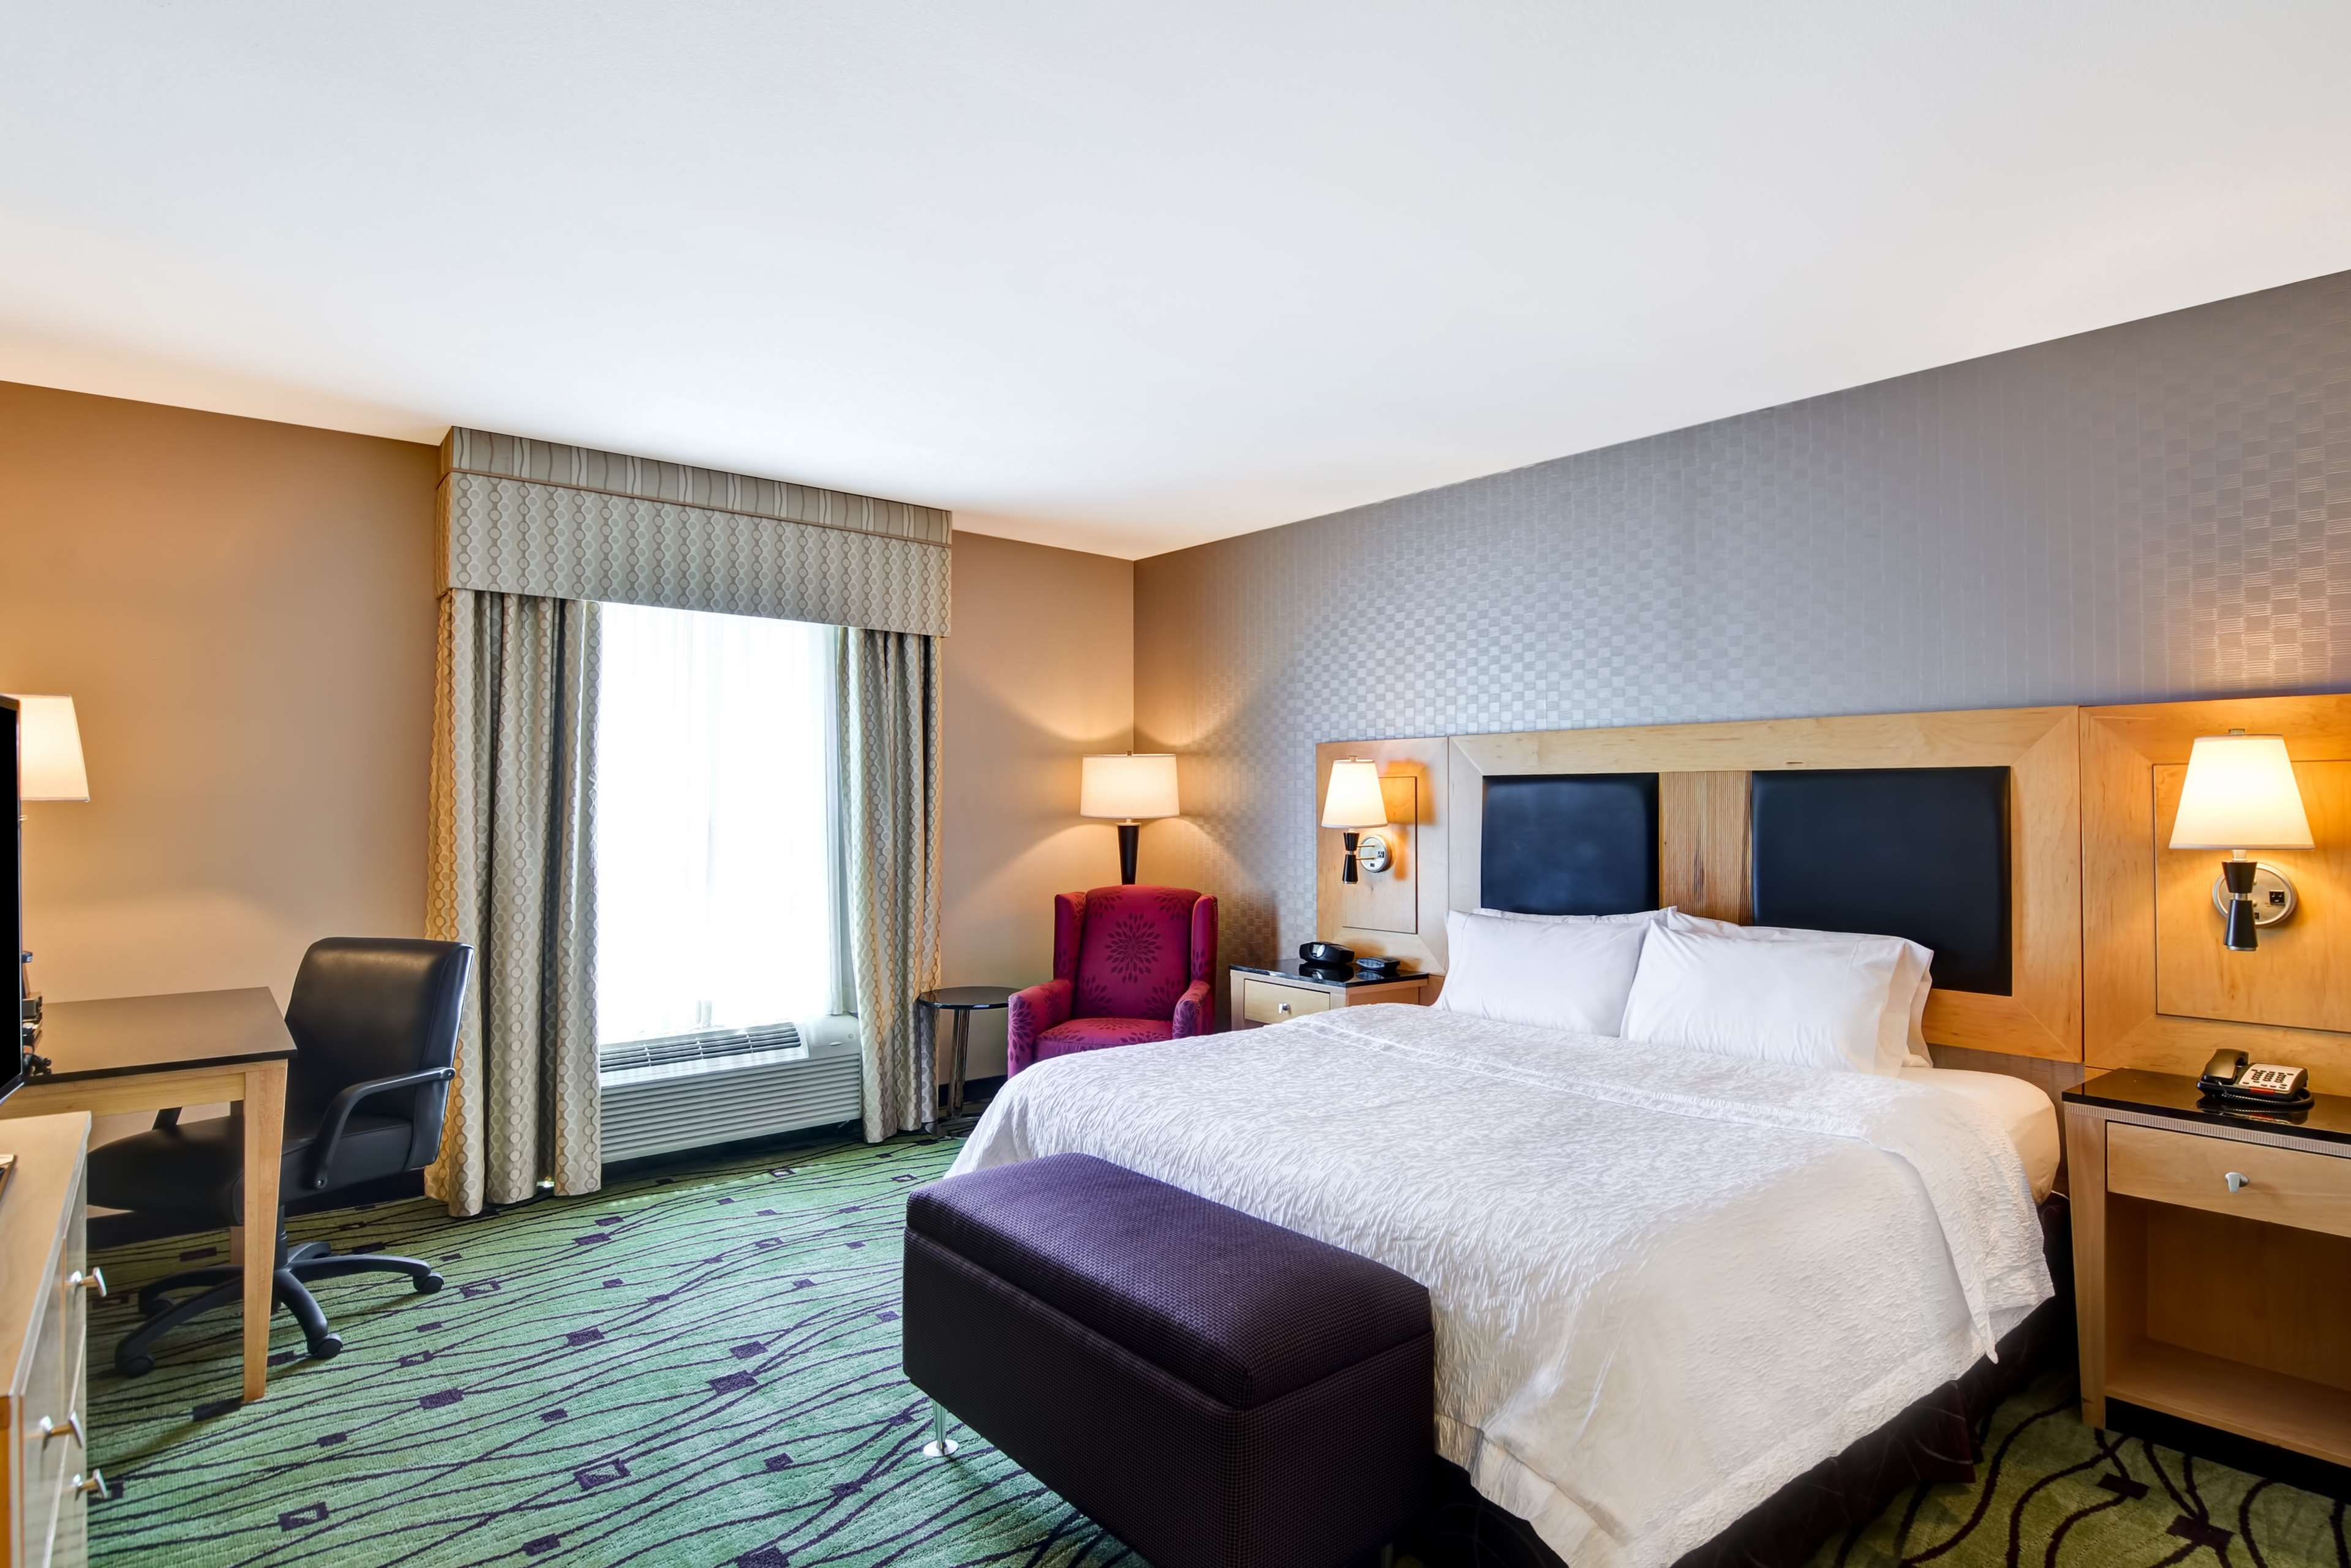 Hampton Inn & Suites Raleigh/Crabtree Valley image 19